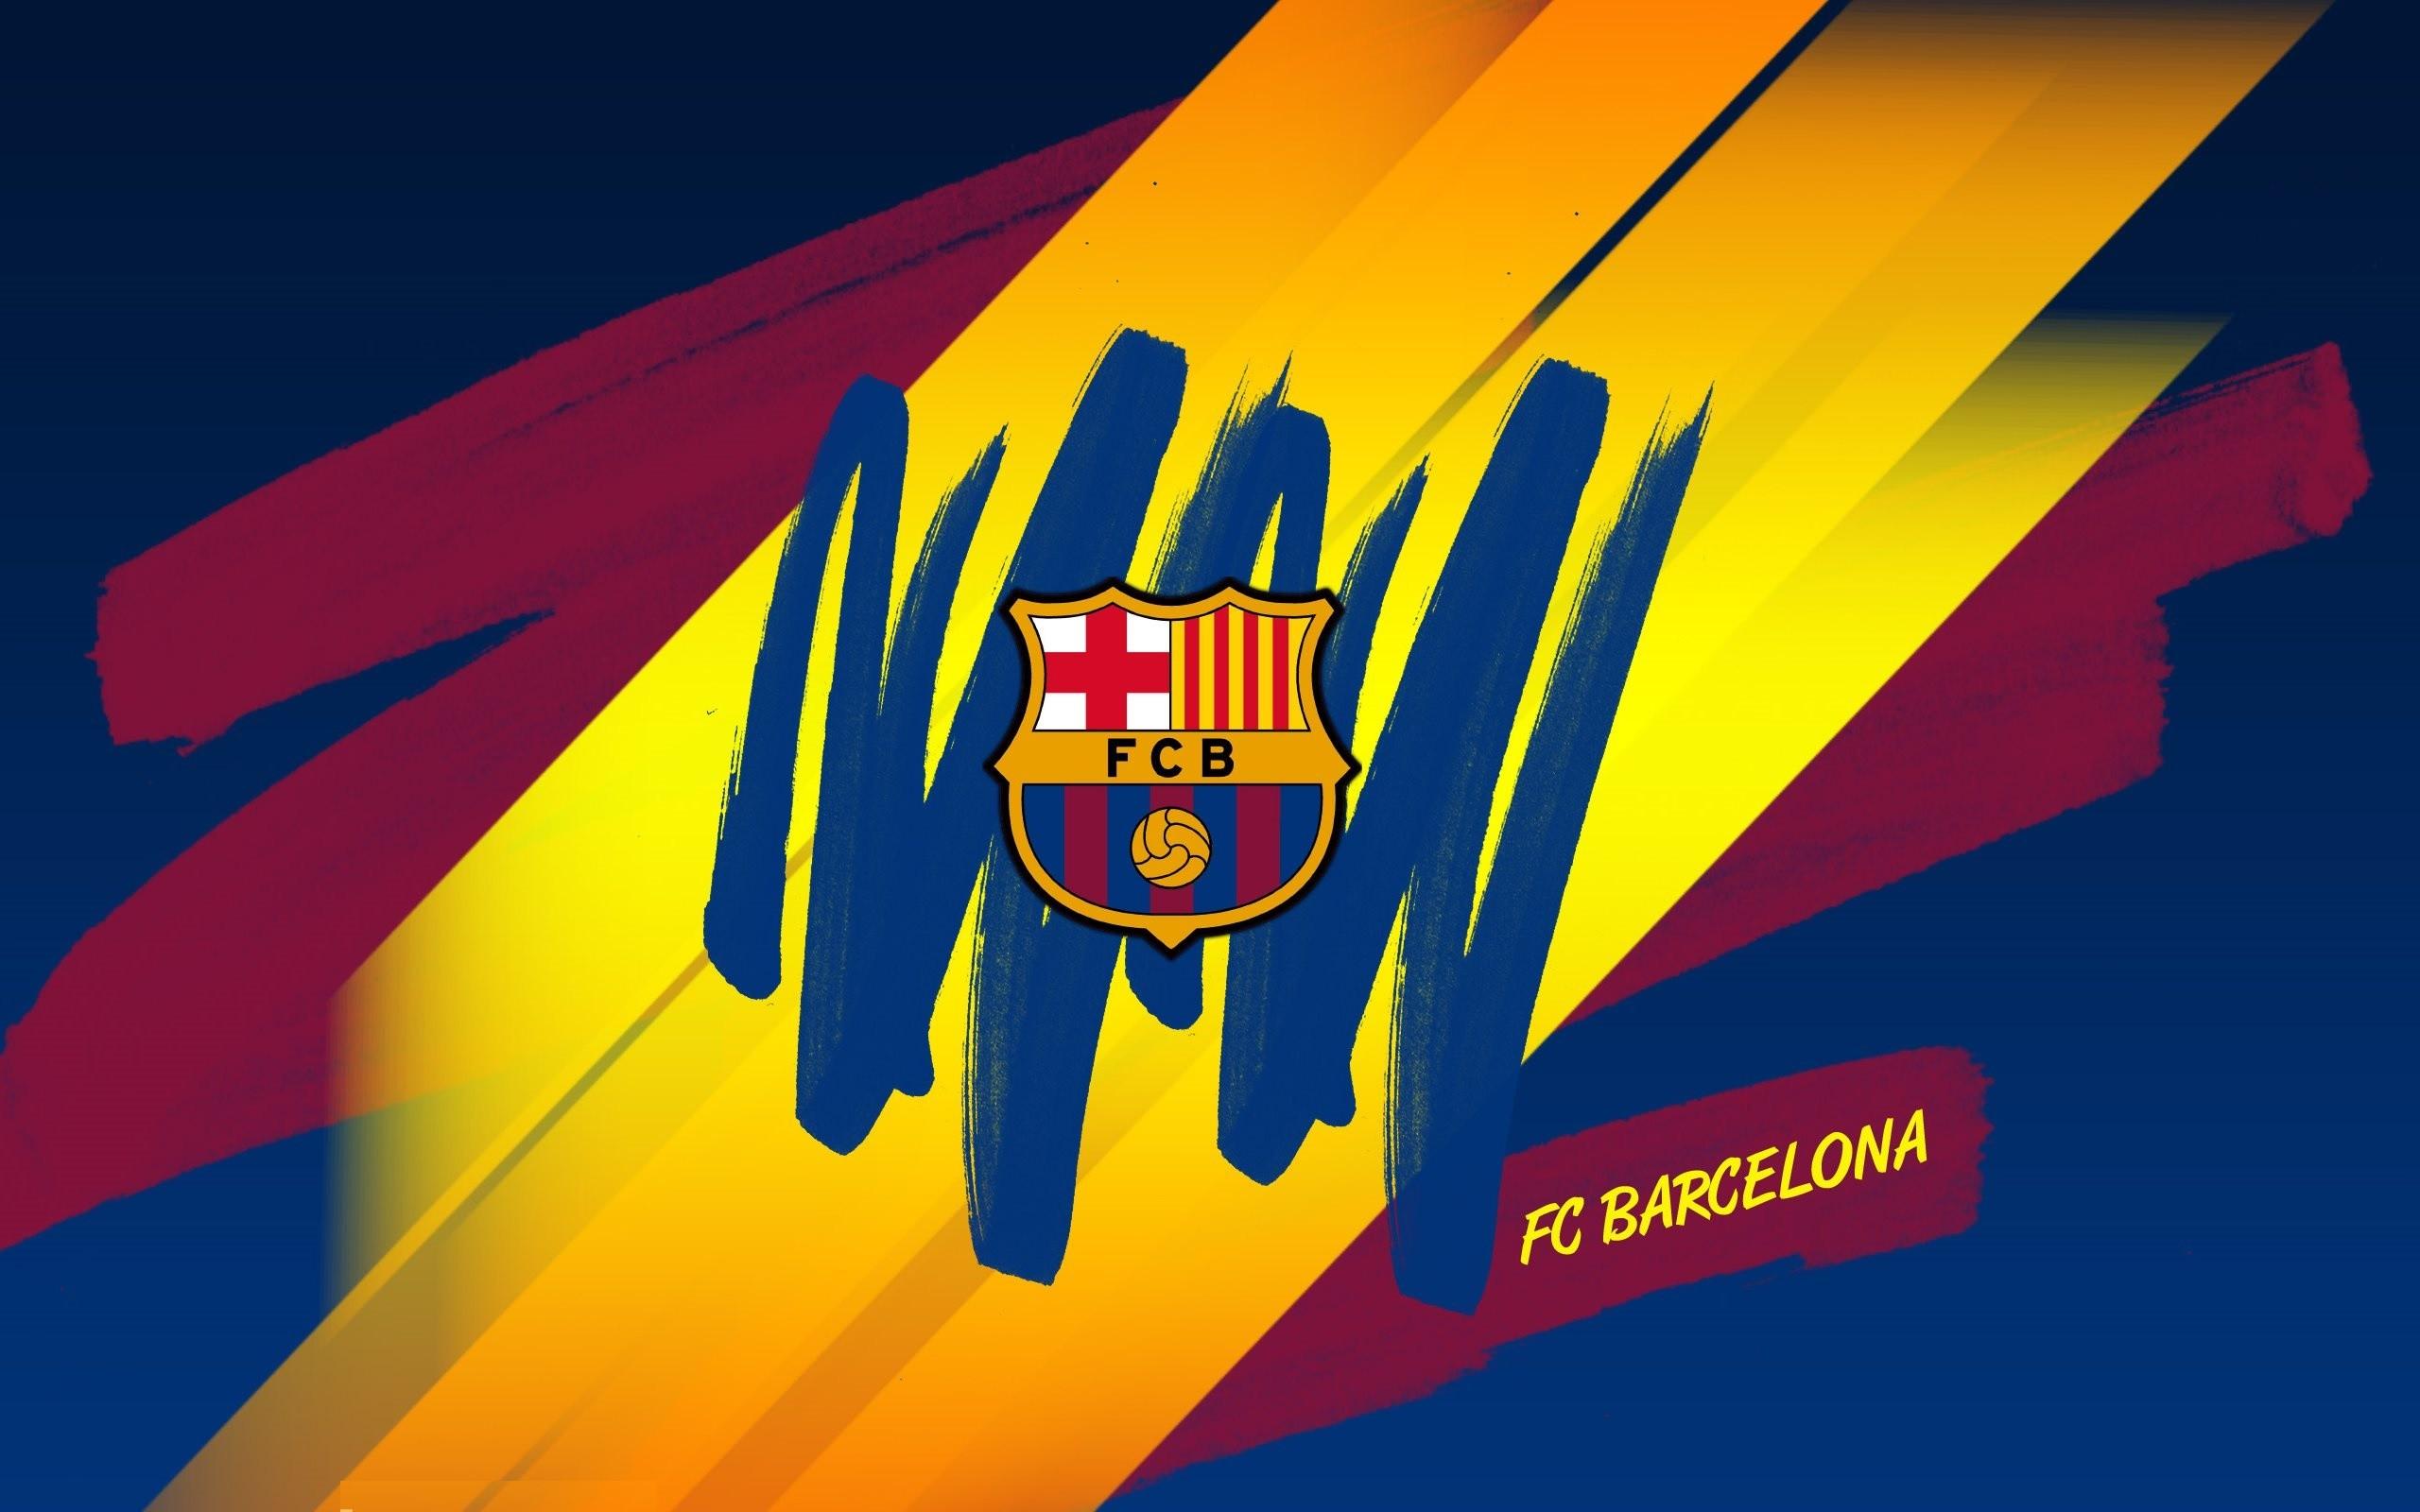 Fc Barcelona Logo Wallpaper ·â' WallpaperTag